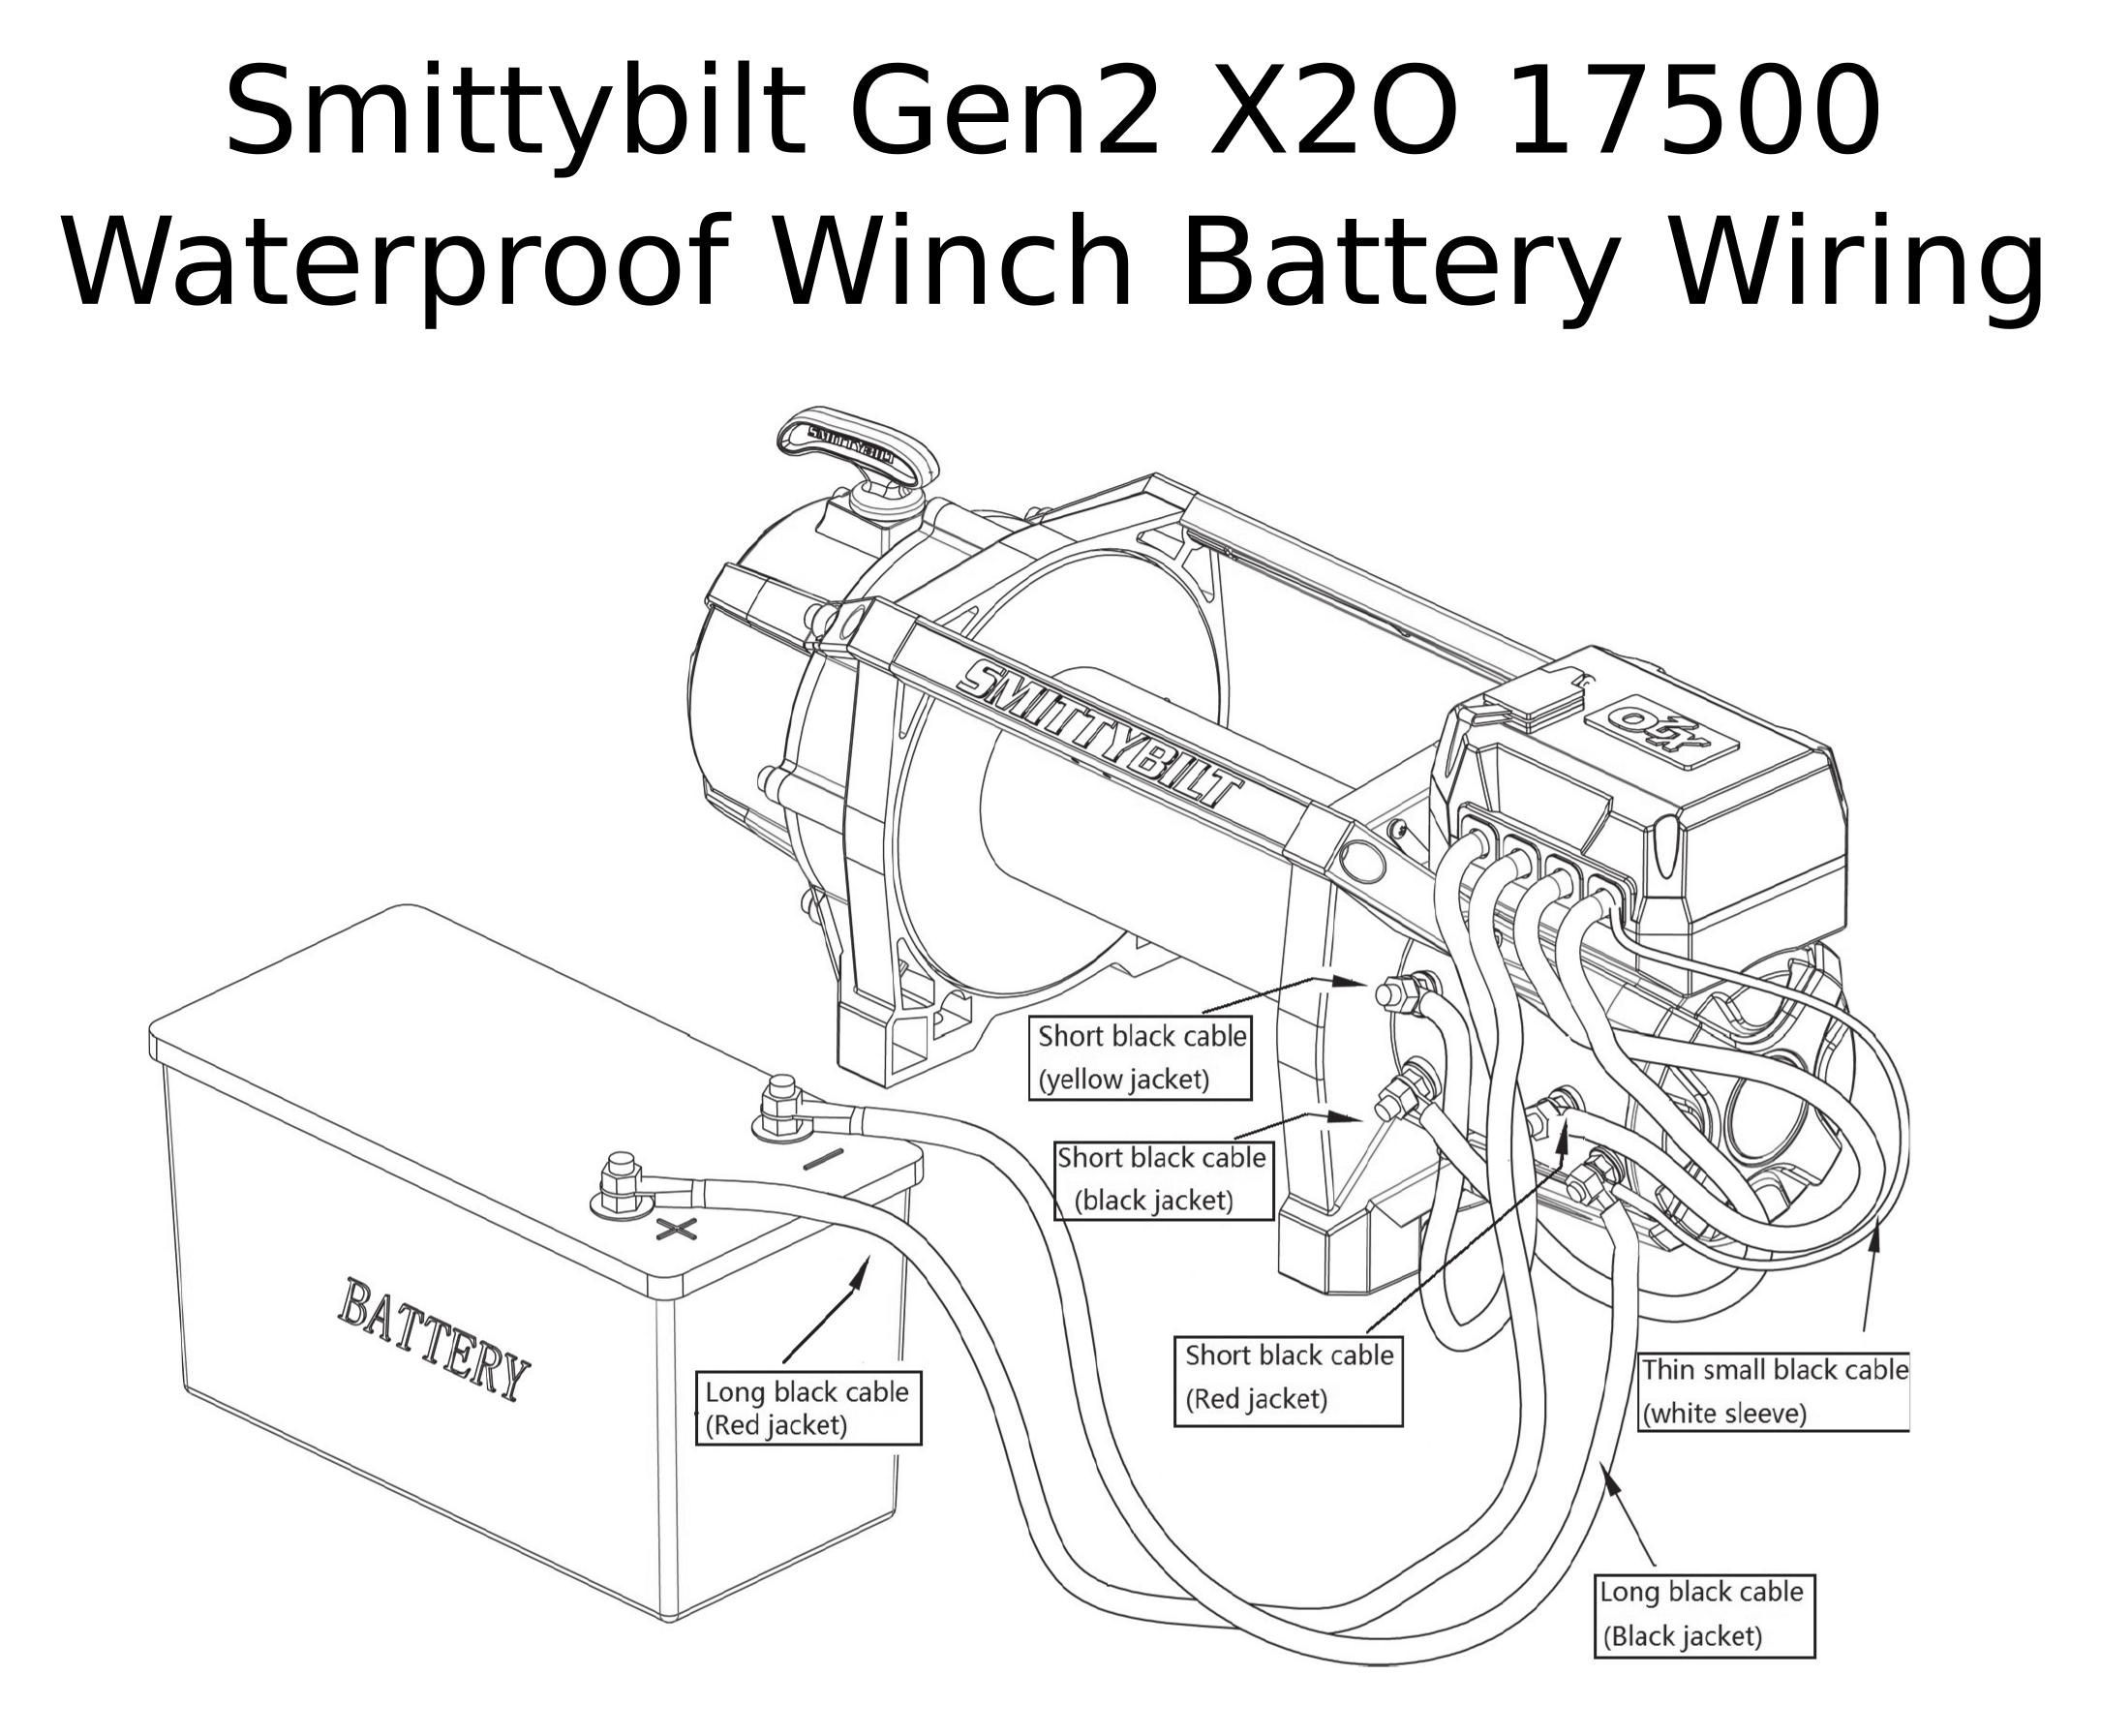 Complete Specs Smittybilt Gen2 X2o 17500 Waterproof Winch 97517 Roundforge